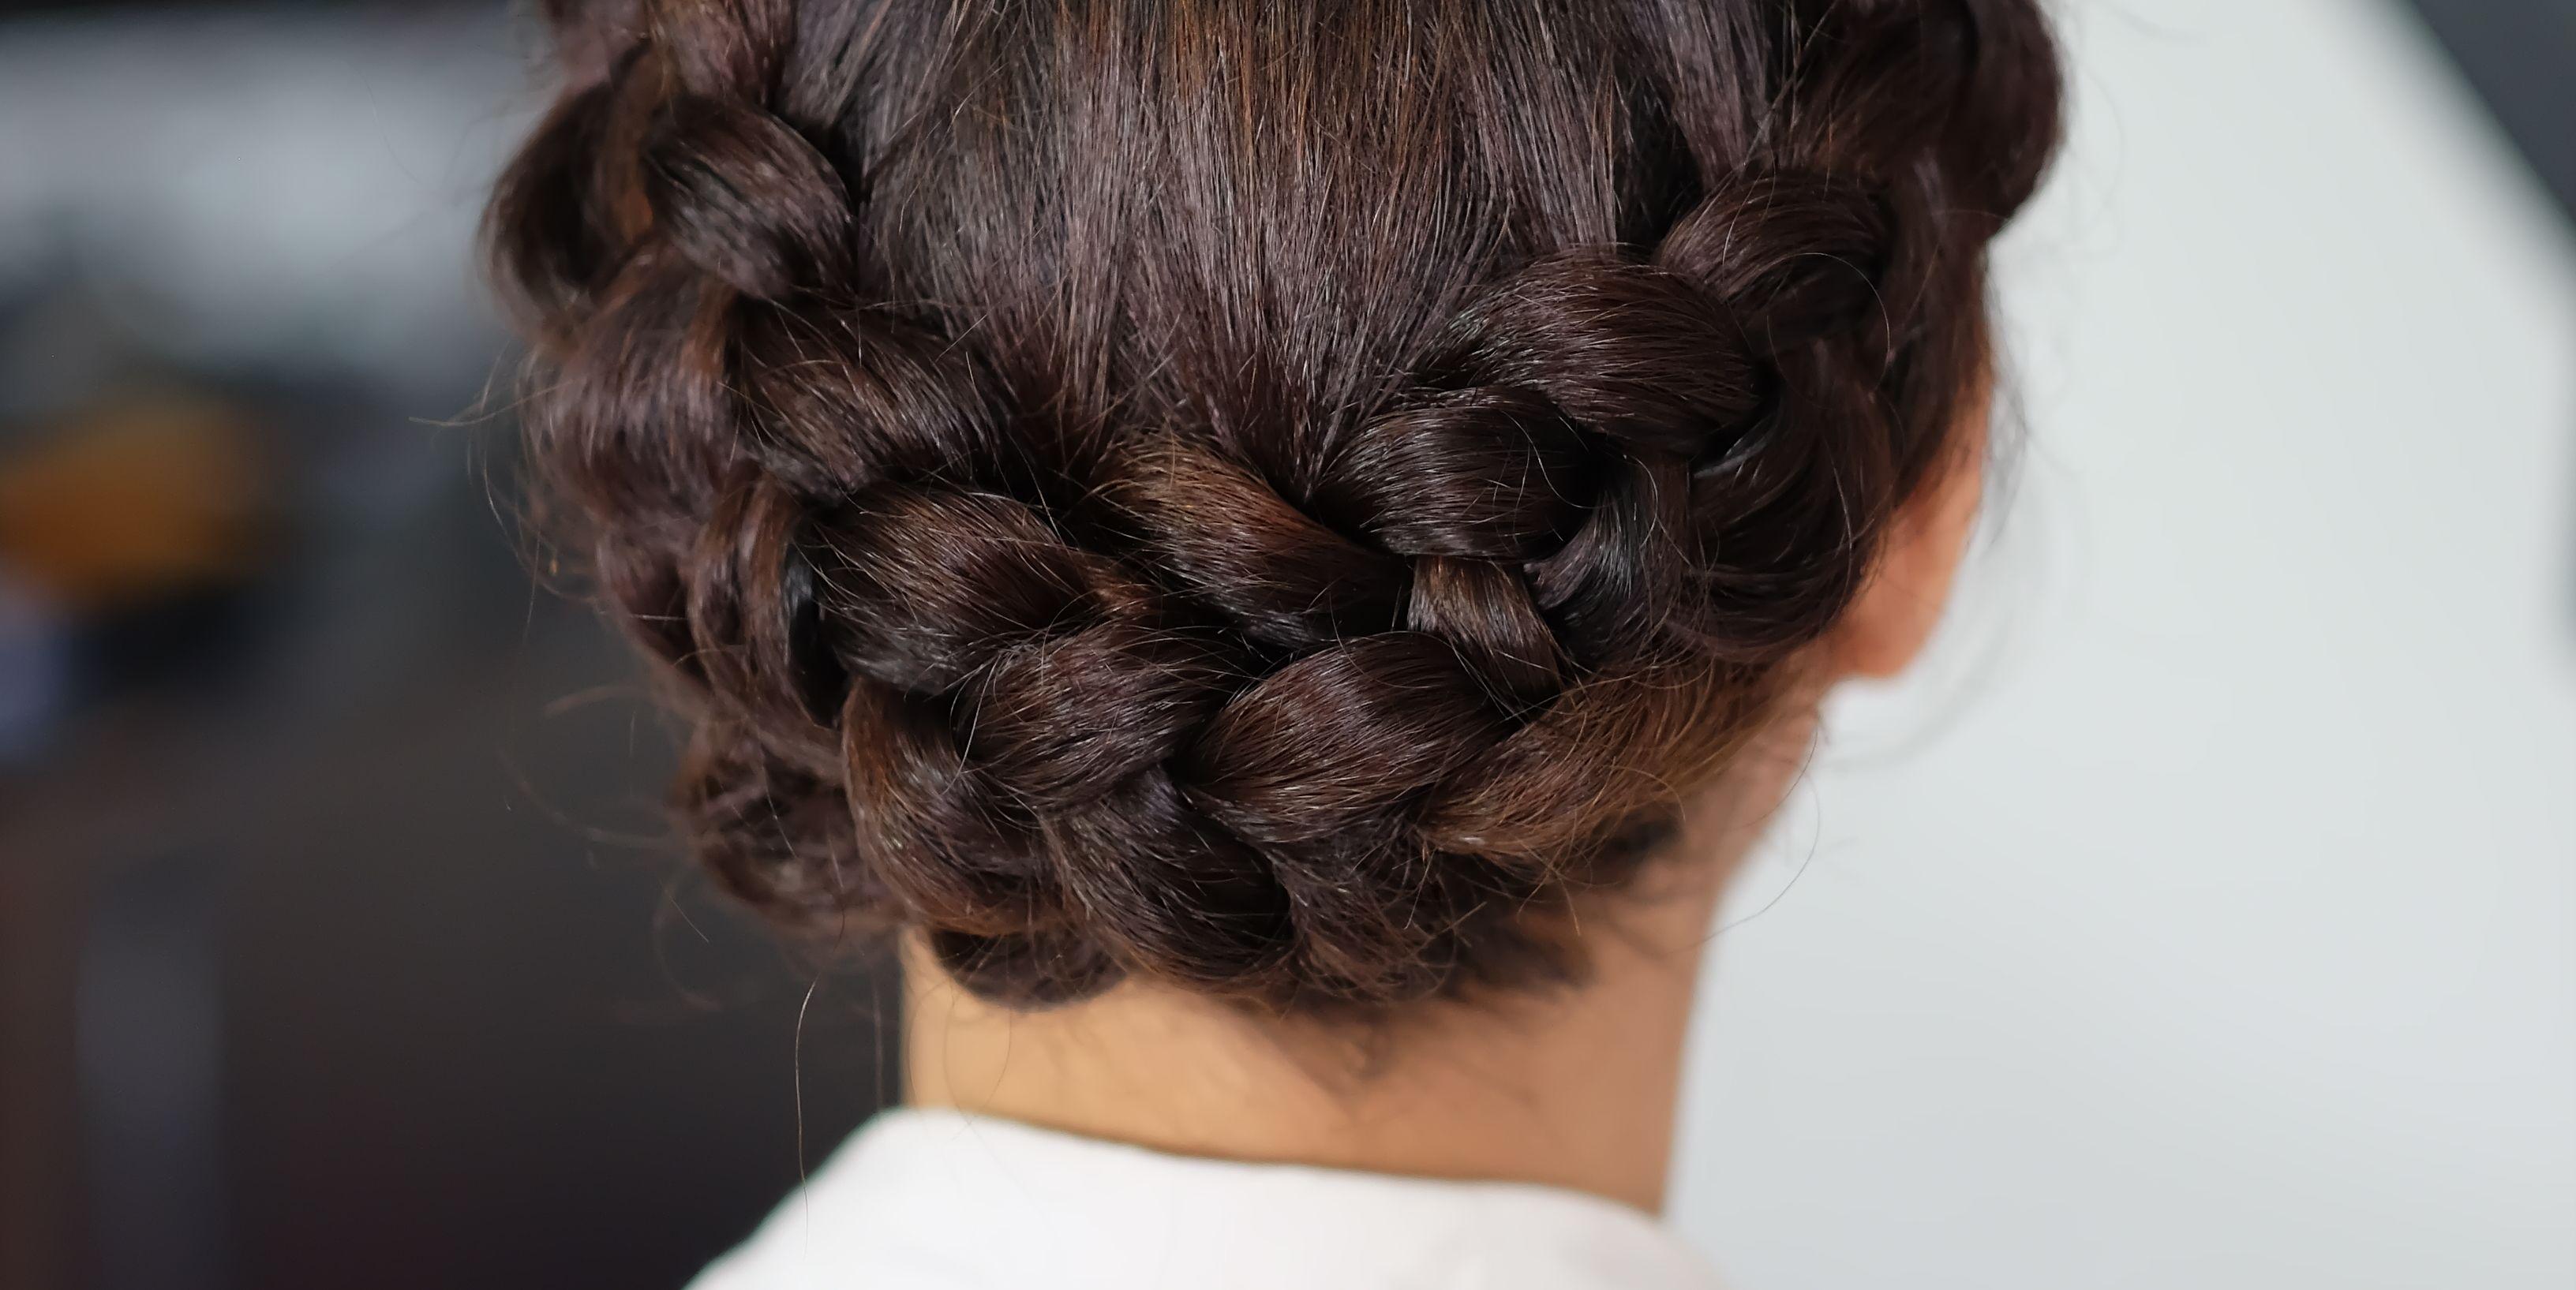 16 marathon hair ideas from Pinterest